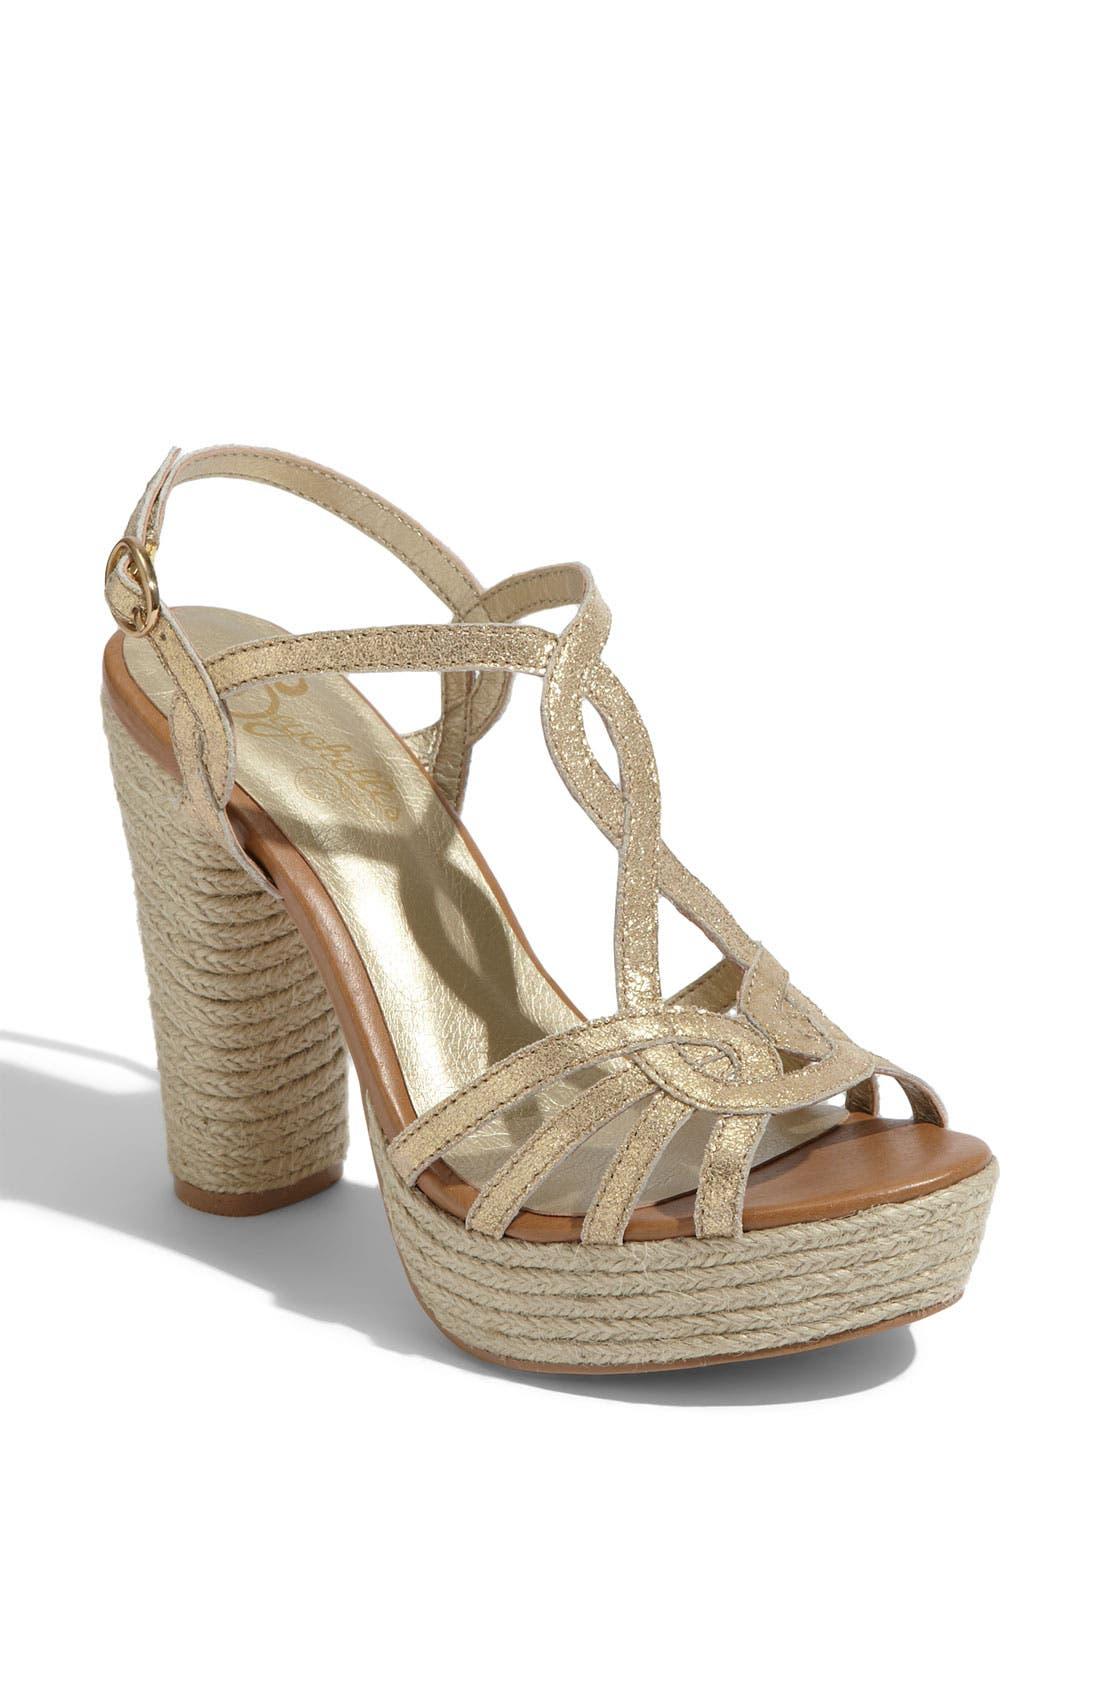 Main Image - Seychelles 'Pickford' Sandal